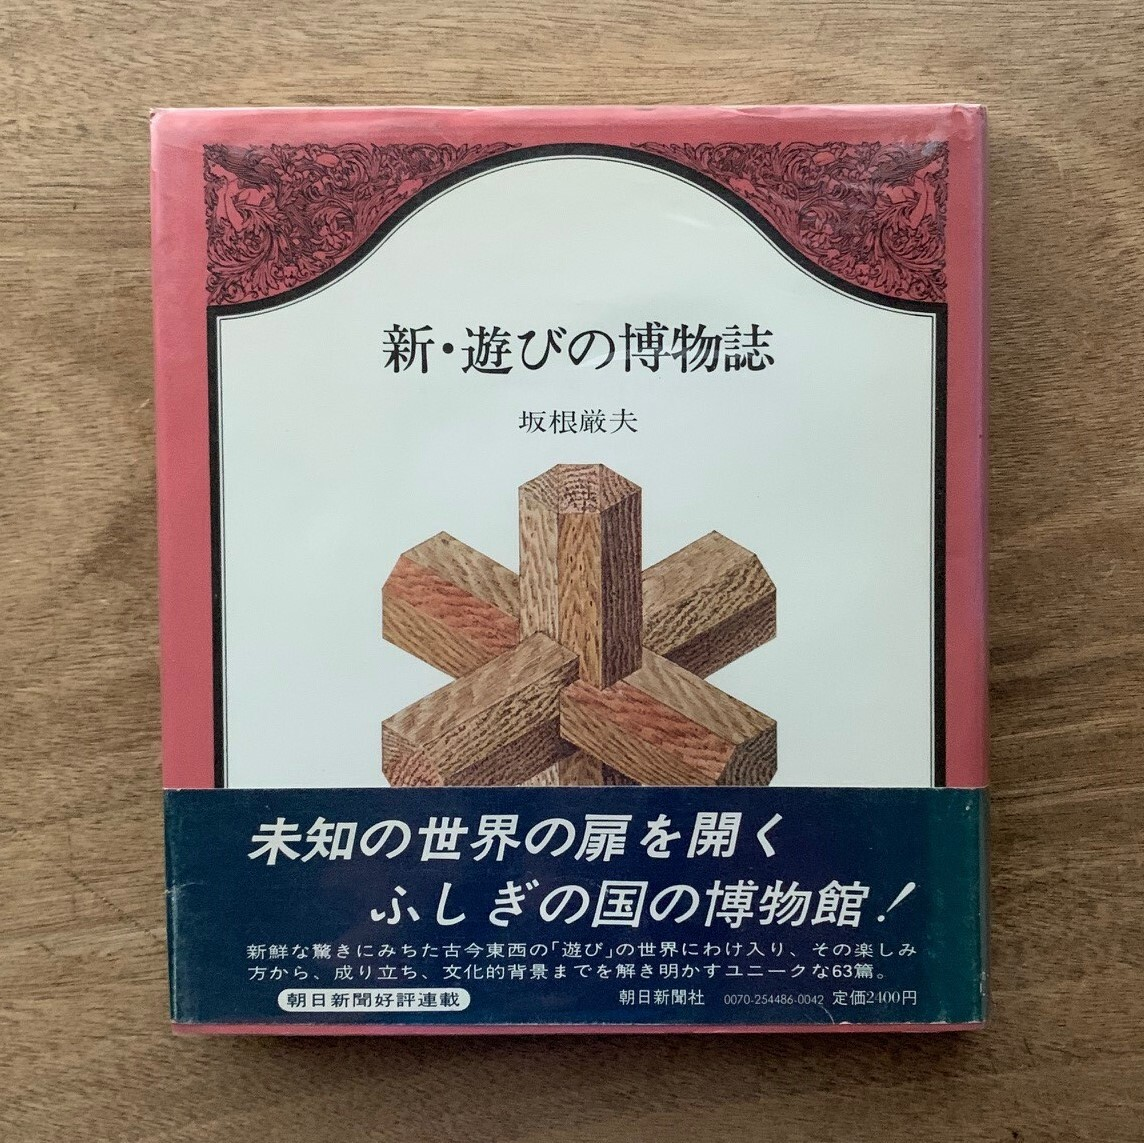 新・遊びの博物誌 / 坂根厳夫(著) / 安野光雅(装丁)